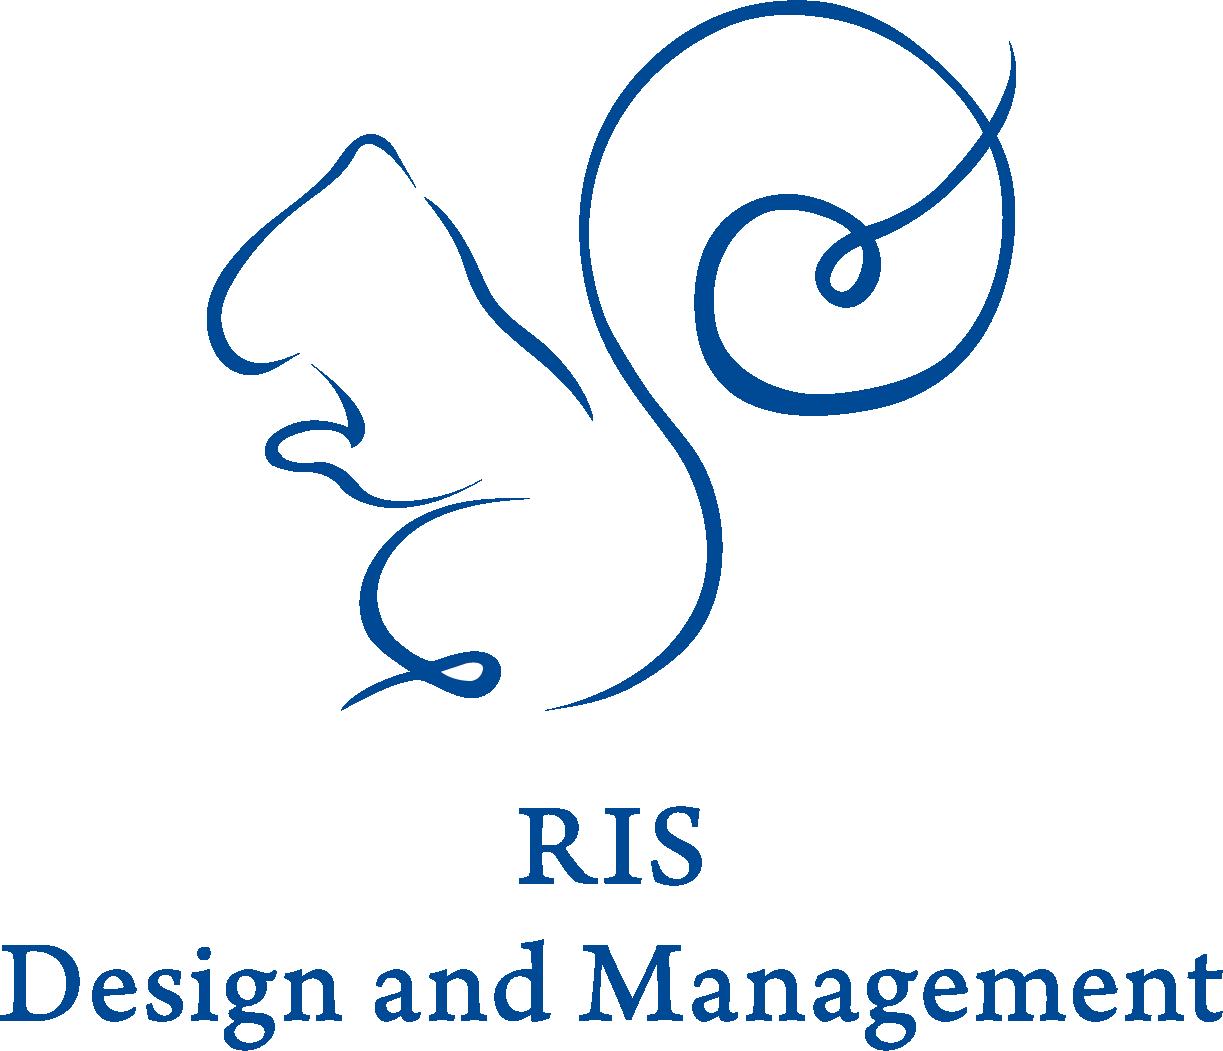 RIS Design and Management